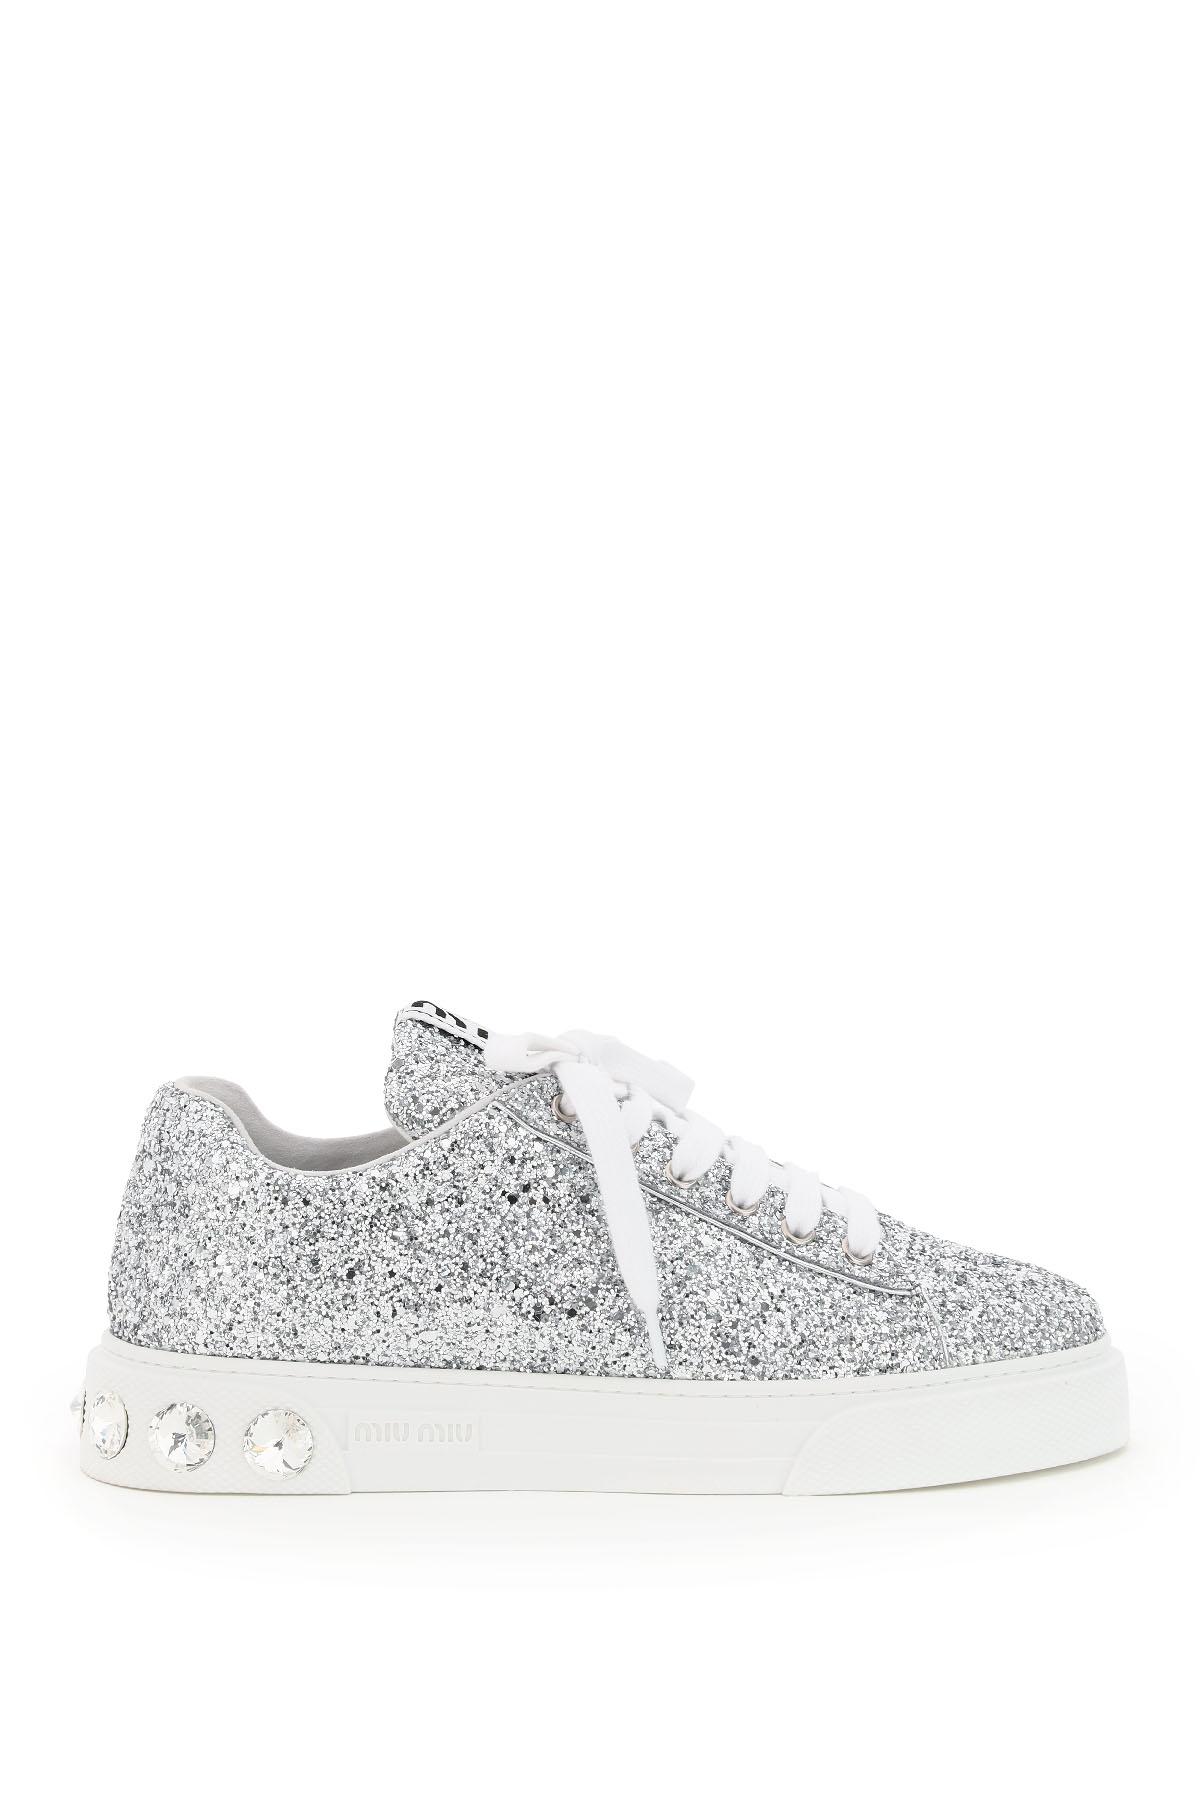 Miu miu sneakers glitter crystal